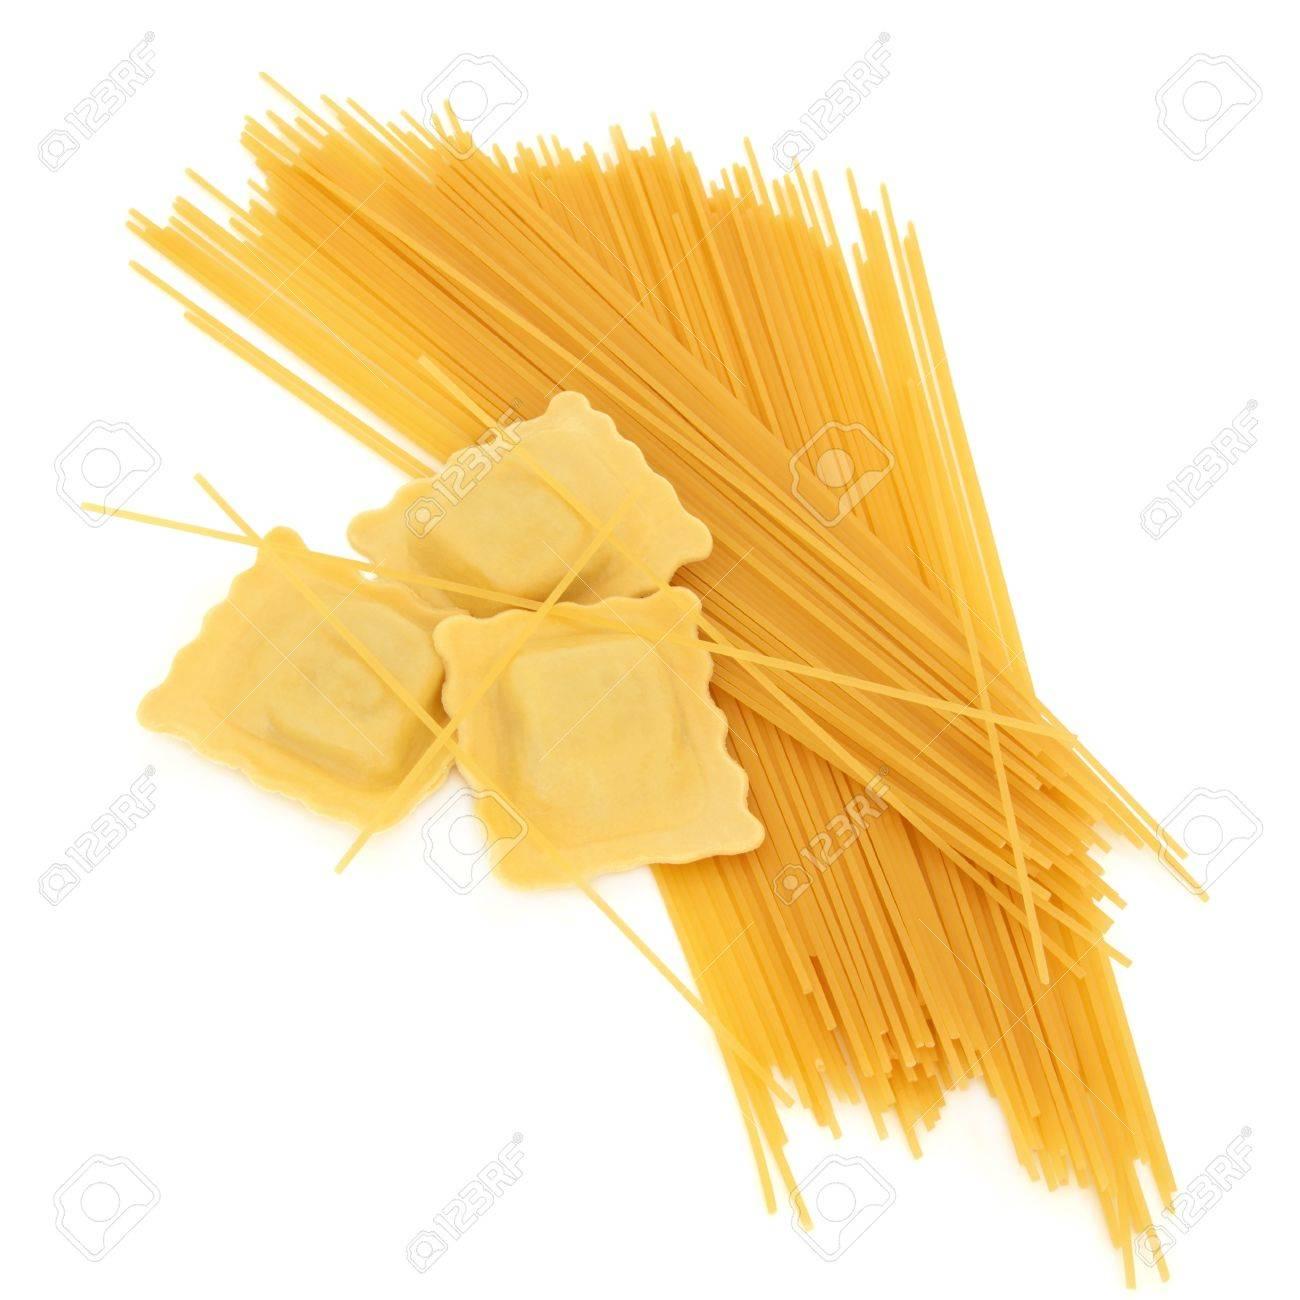 Ravioli pasta with spaghetti isolated over white background. Stock Photo - 10615834